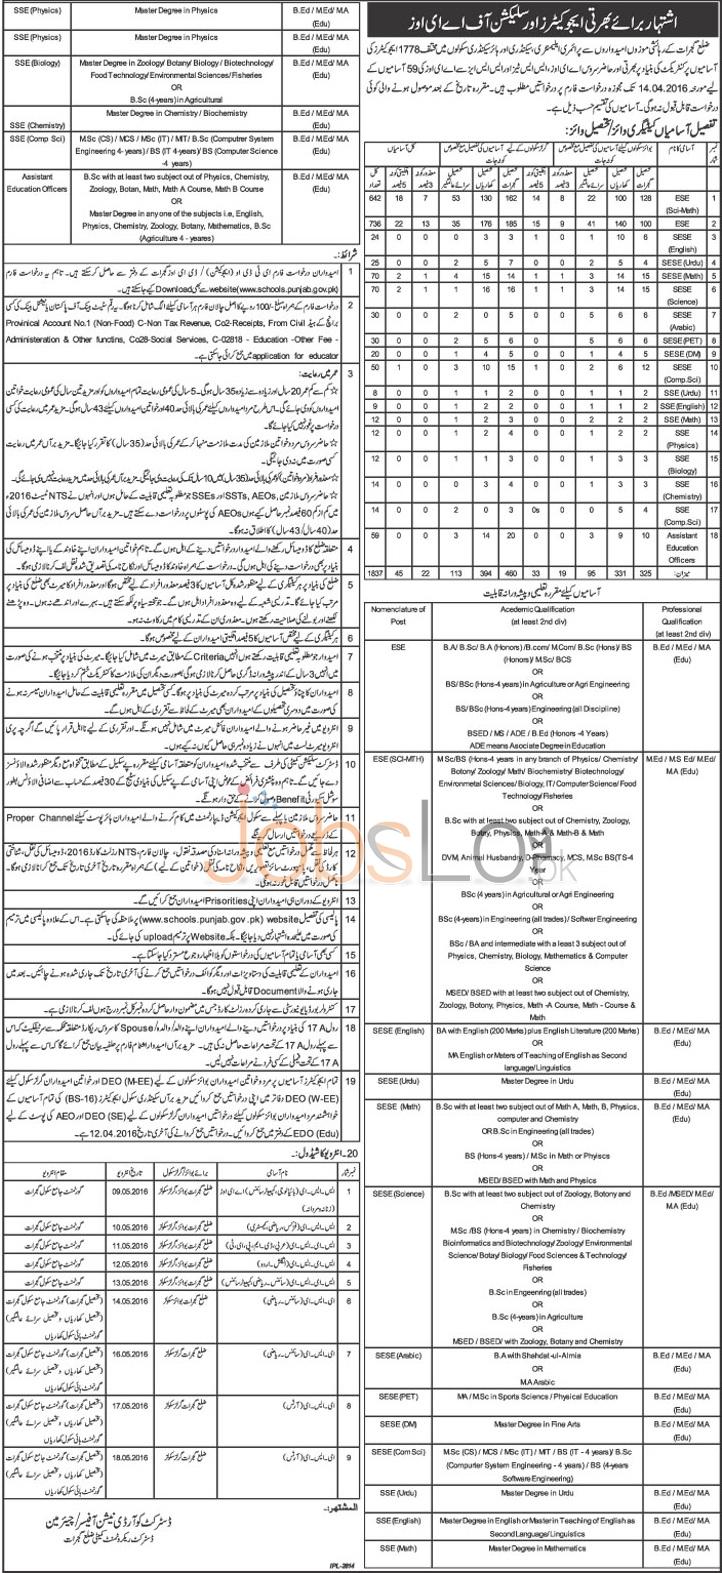 Punjab Educators Jobs in Gujrat 2016 For 1778 Educators Application Form